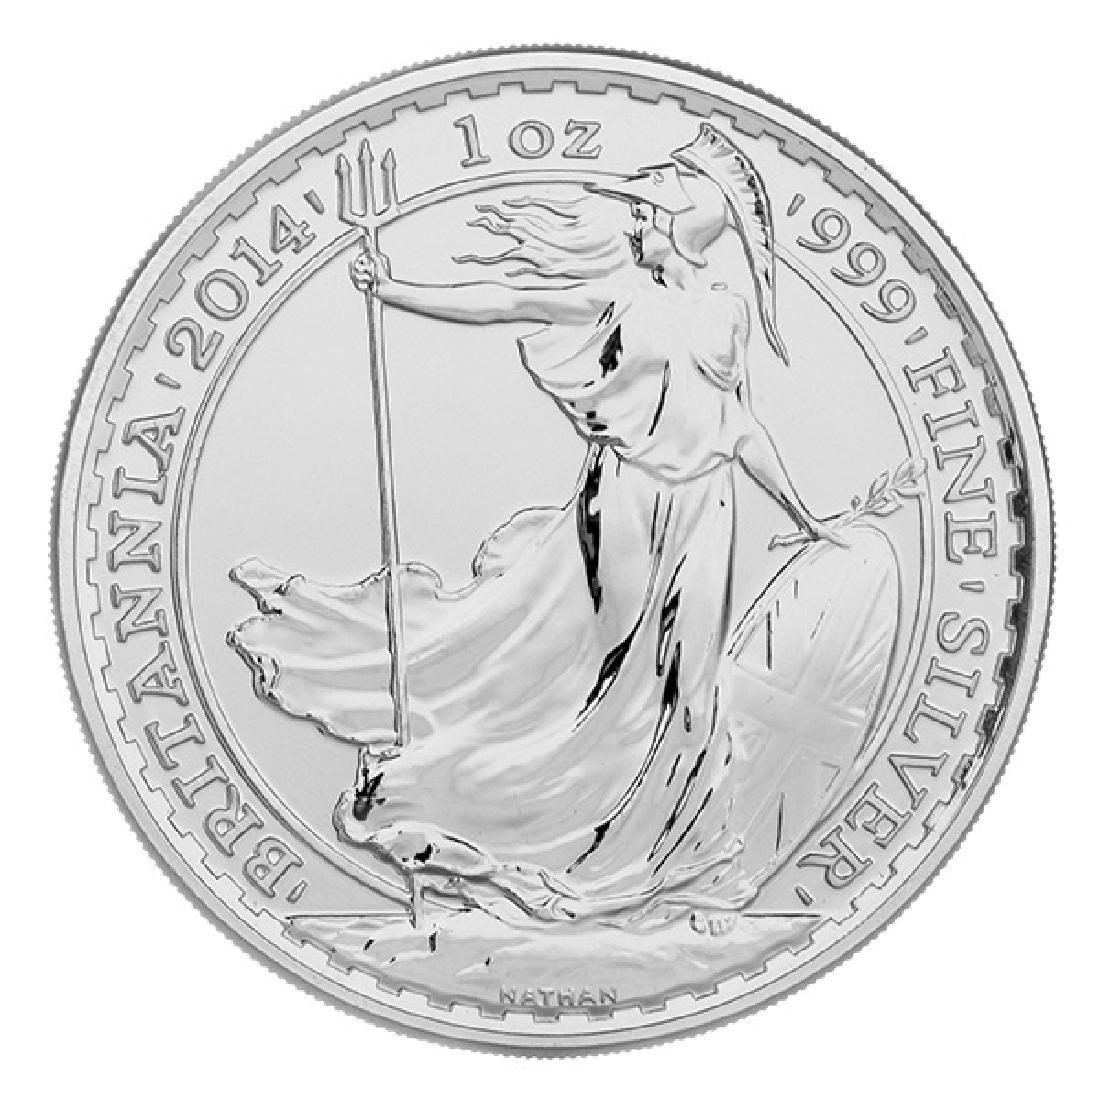 Uncirculated Silver Britannia 1 oz 2014